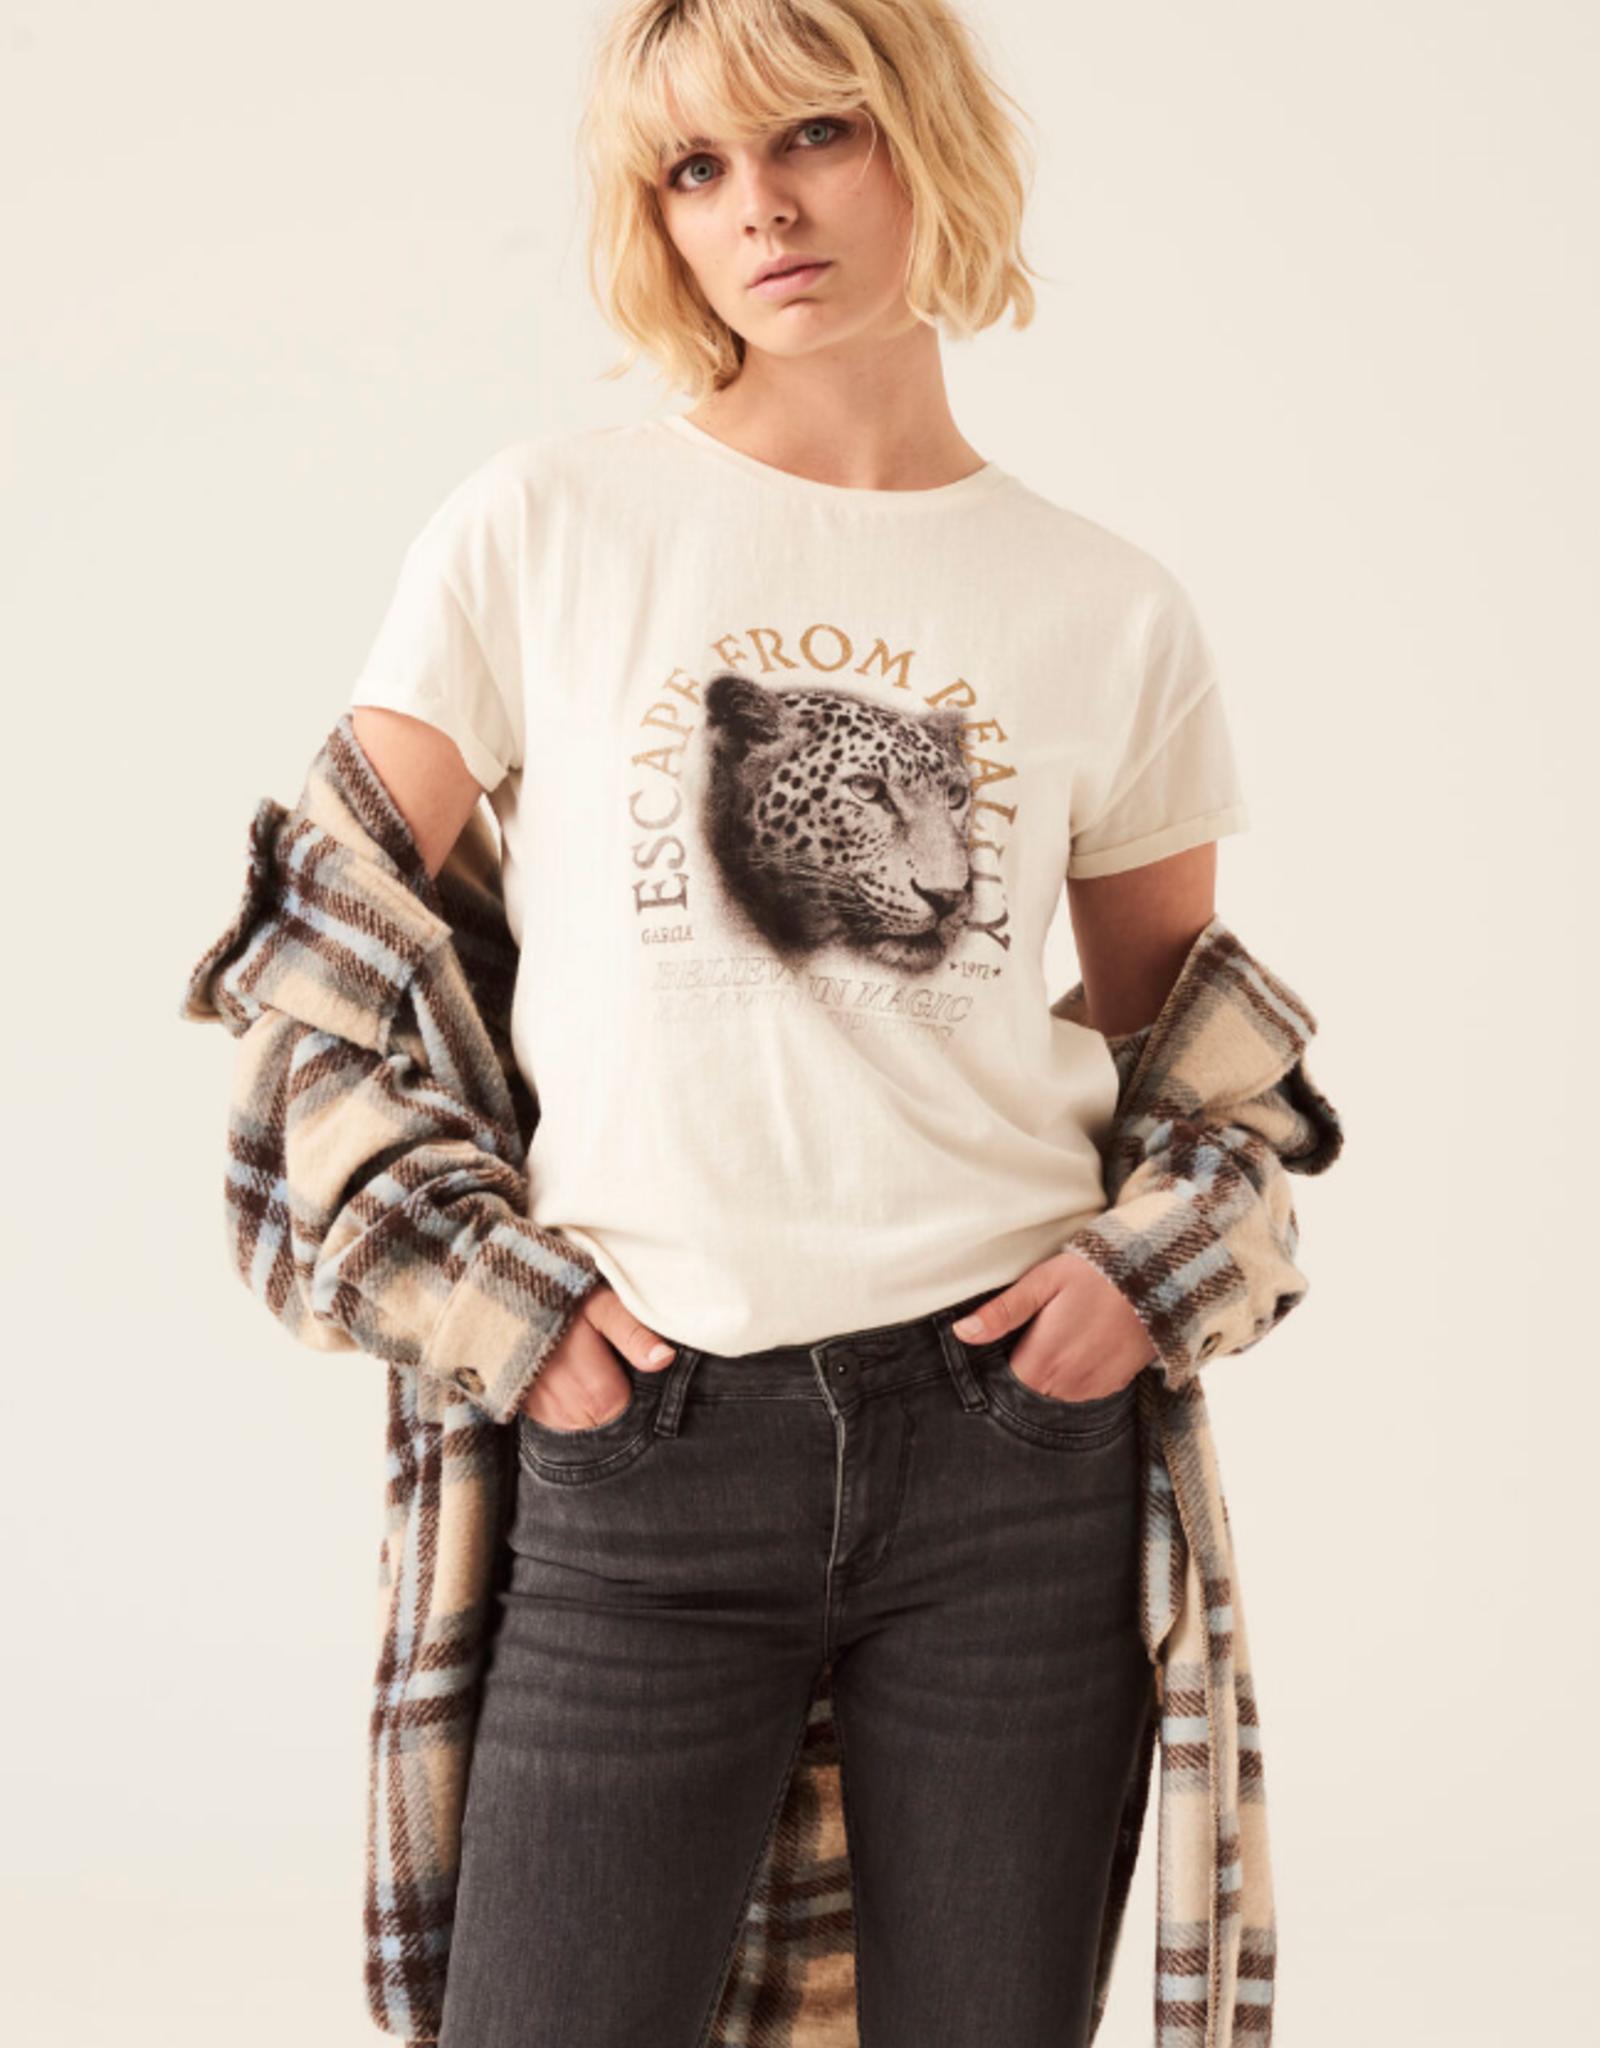 Garcia Garcia - I10091 Shirt